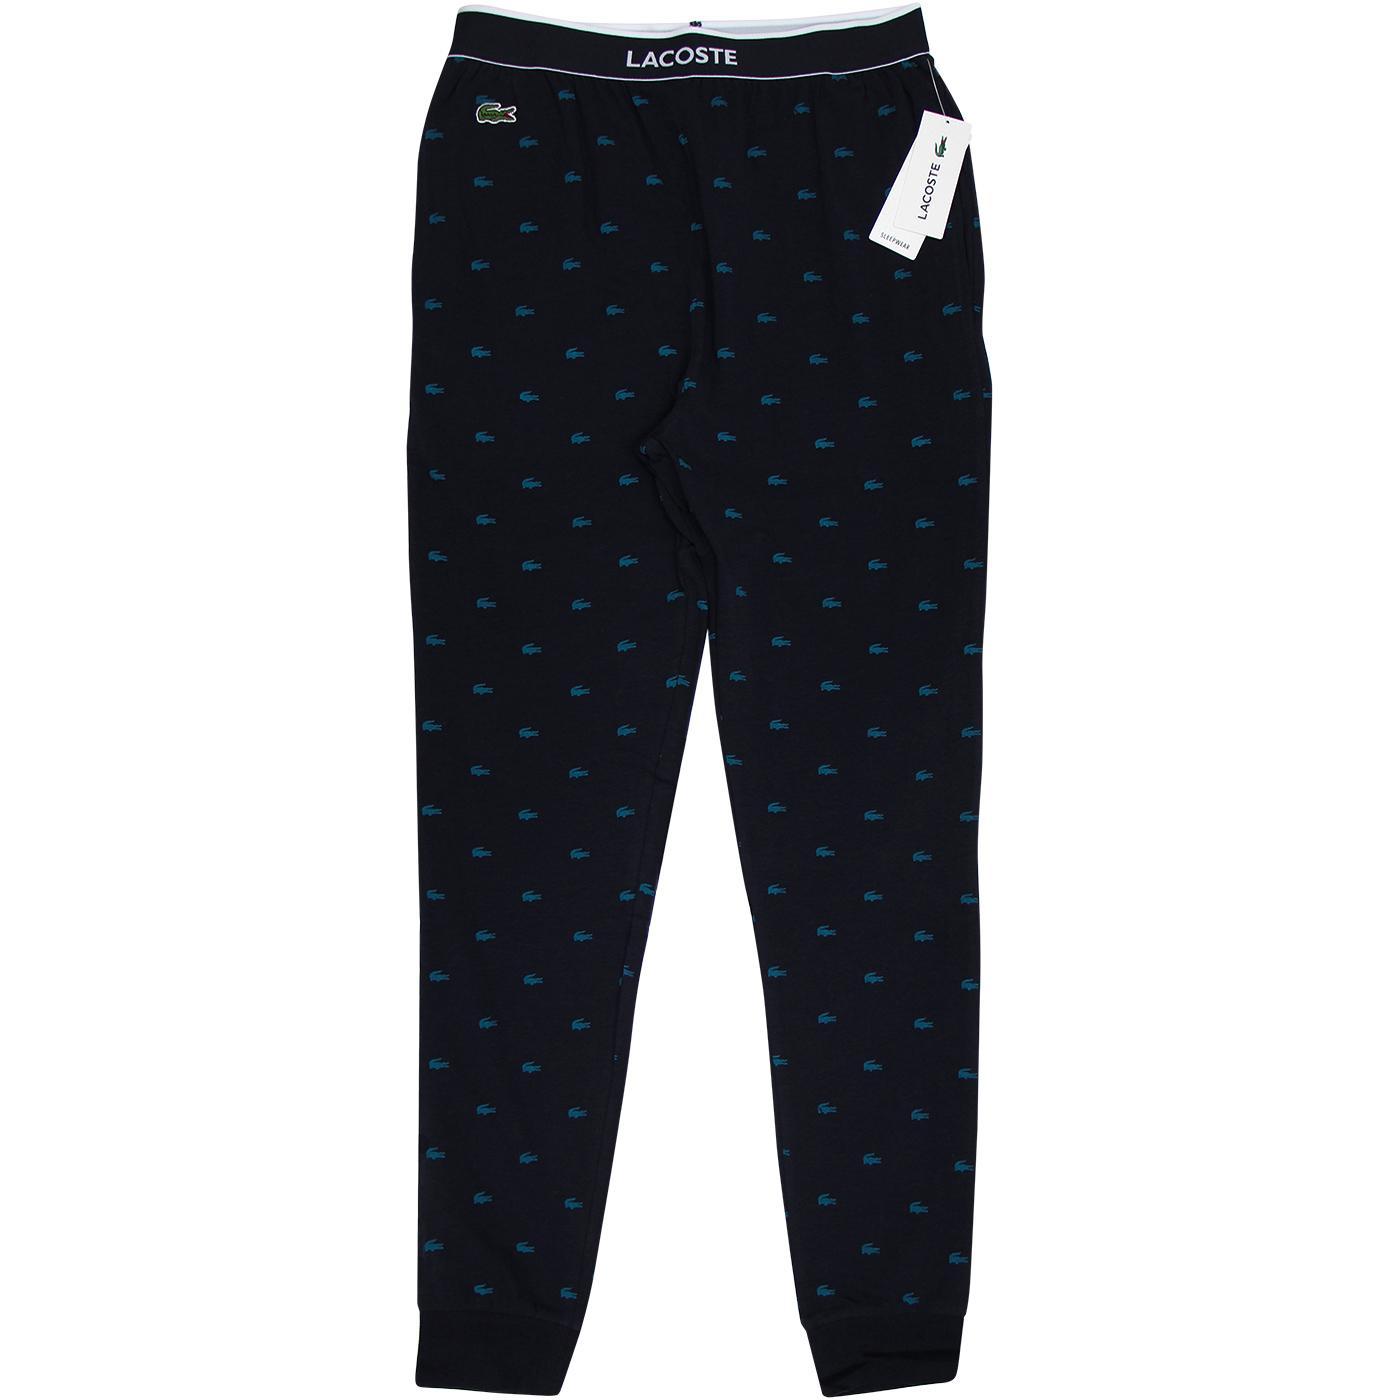 LACOSTE Men's Crocodile Lounge Pants (Night Blue)